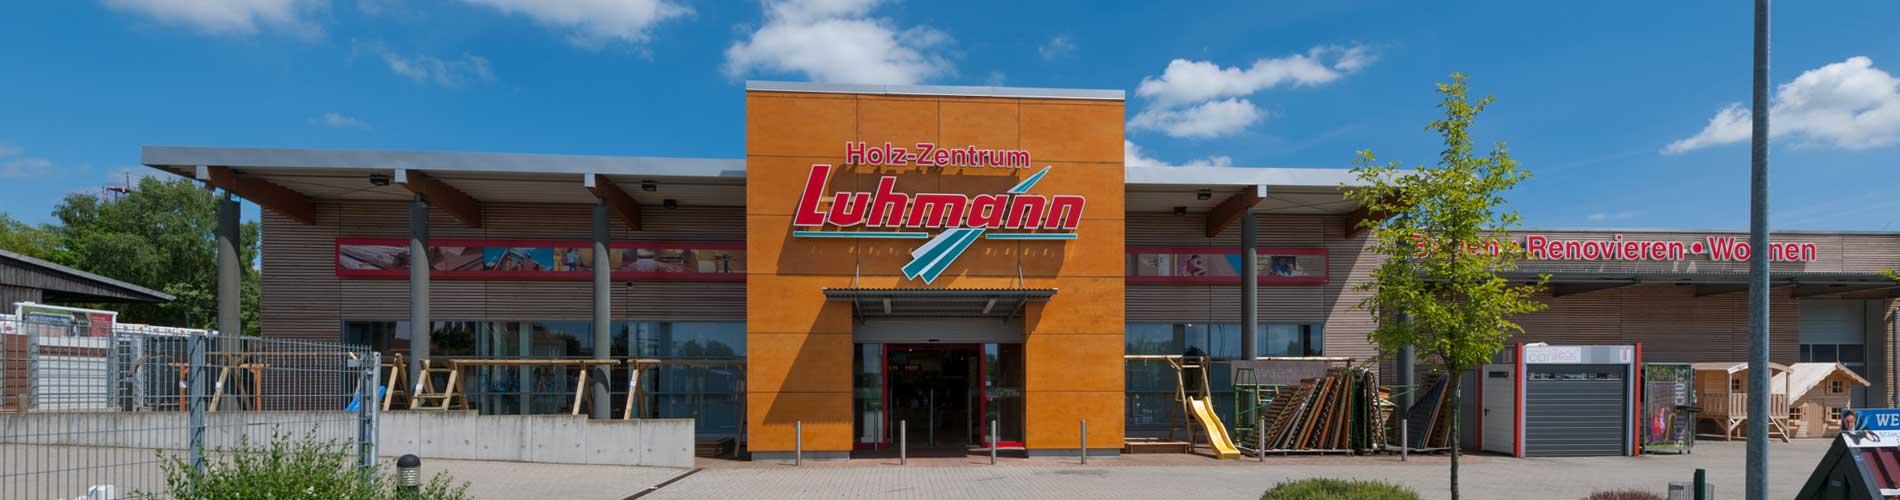 Luhmann Celle Haupteingang